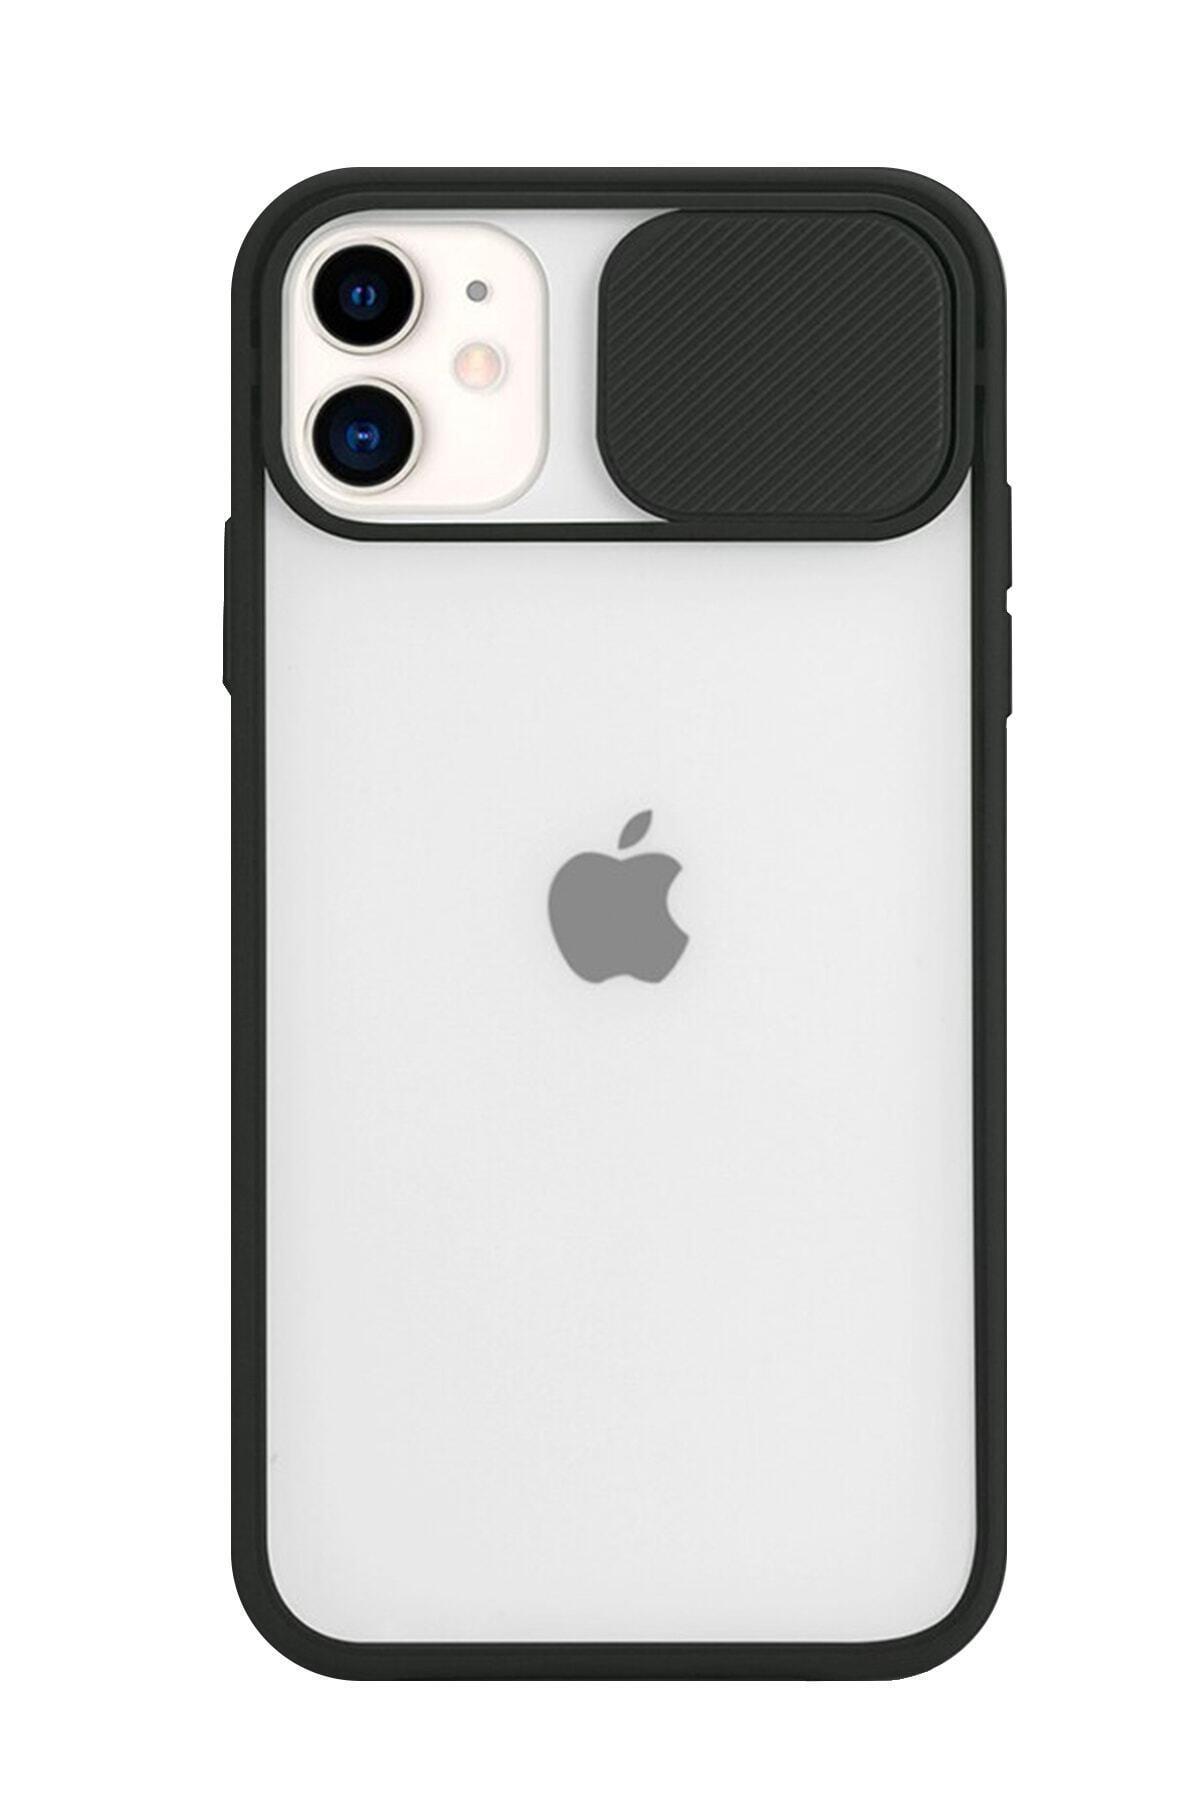 POFHİ Iphone 11 Kamera Slayt Korumalı Siyah Şeffaf Telefon Kılıfı 1